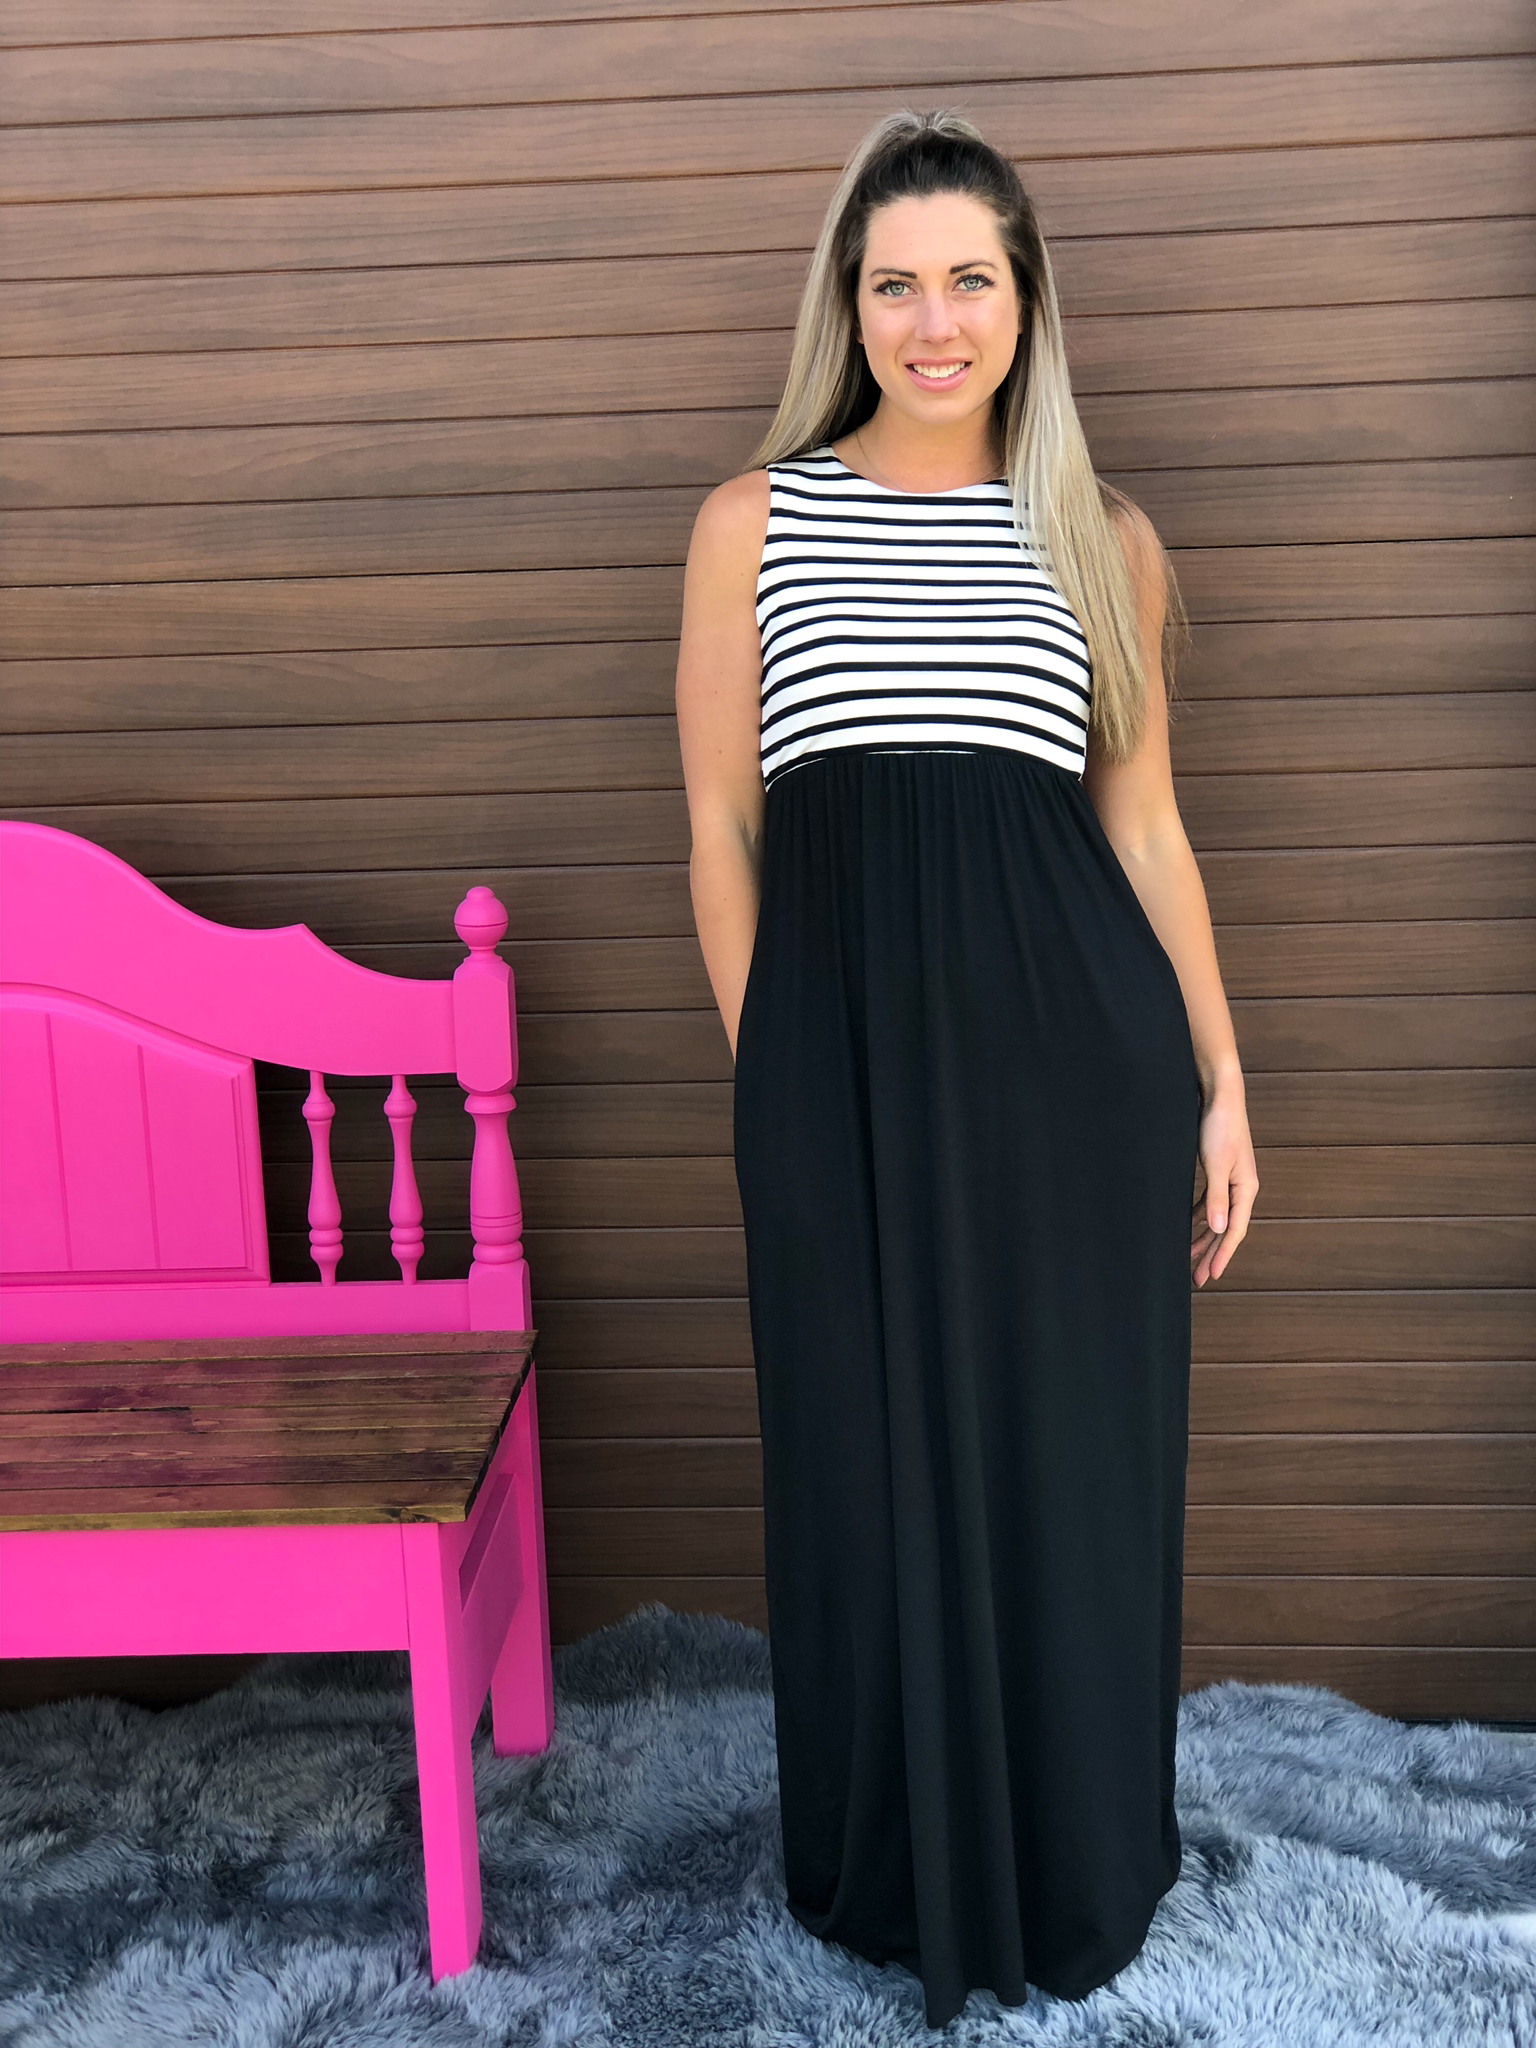 Long Black and White Stripe Maxi Dress 82420